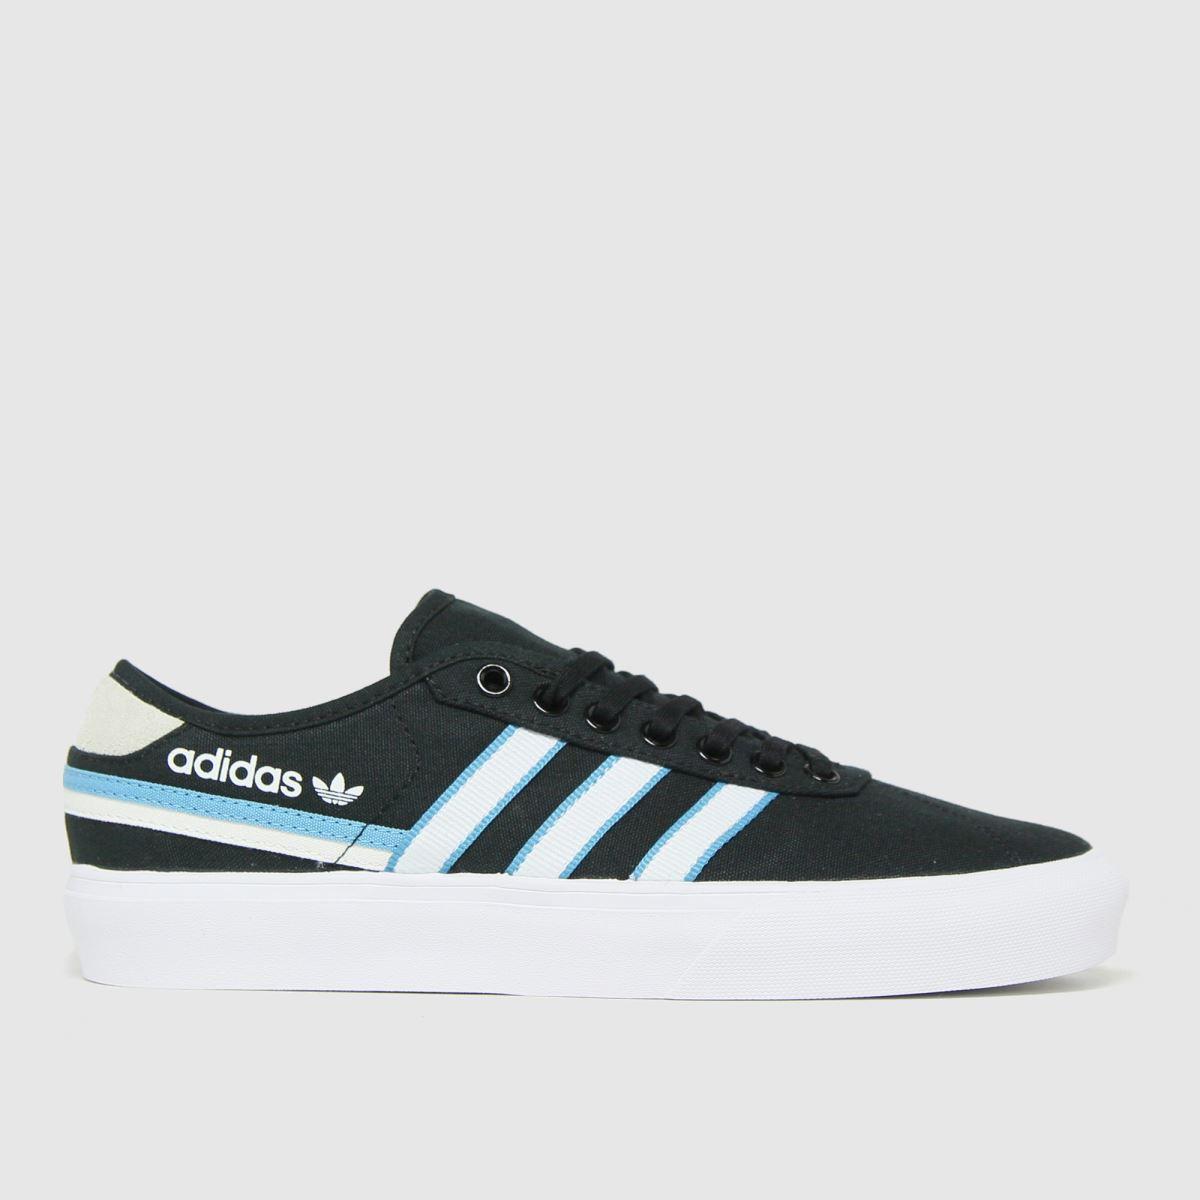 Adidas Black Delpala Trainers